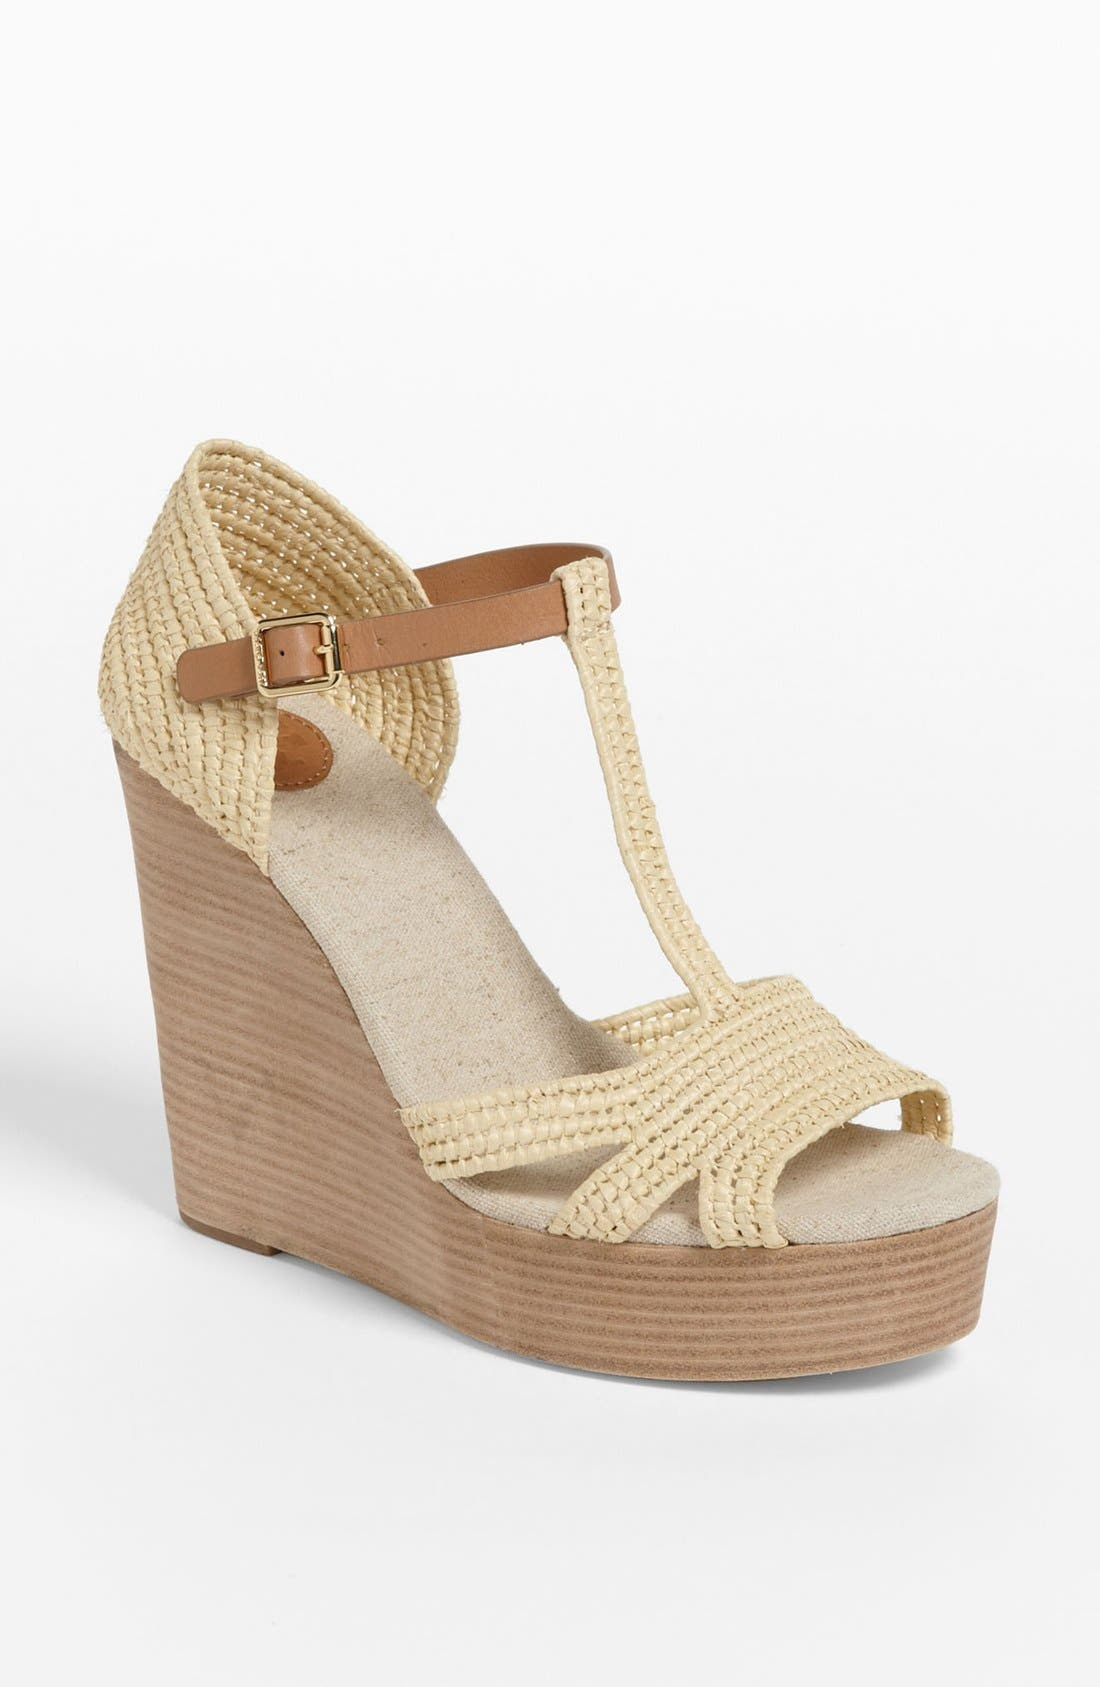 Main Image - Tory Burch 'Carina' Wedge Sandal